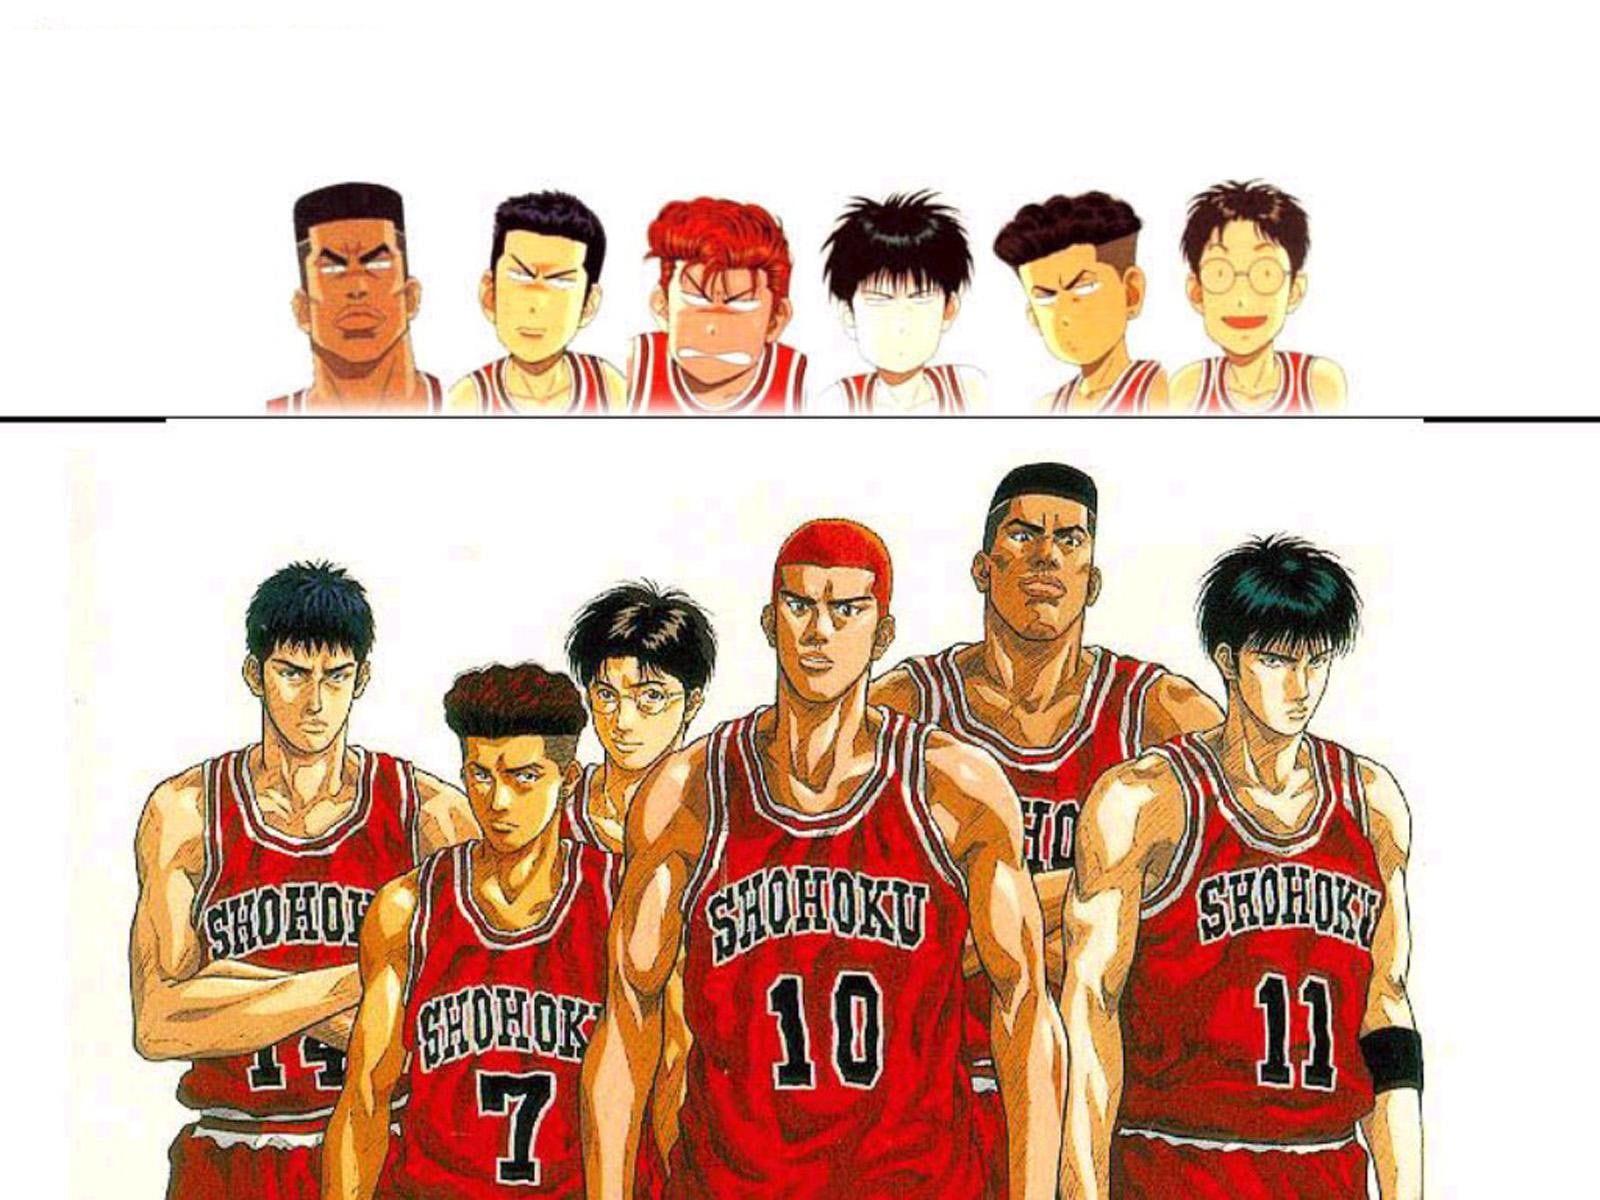 HD wallpaper: anime, basket, cartoon, kid, serial, slam Dunk